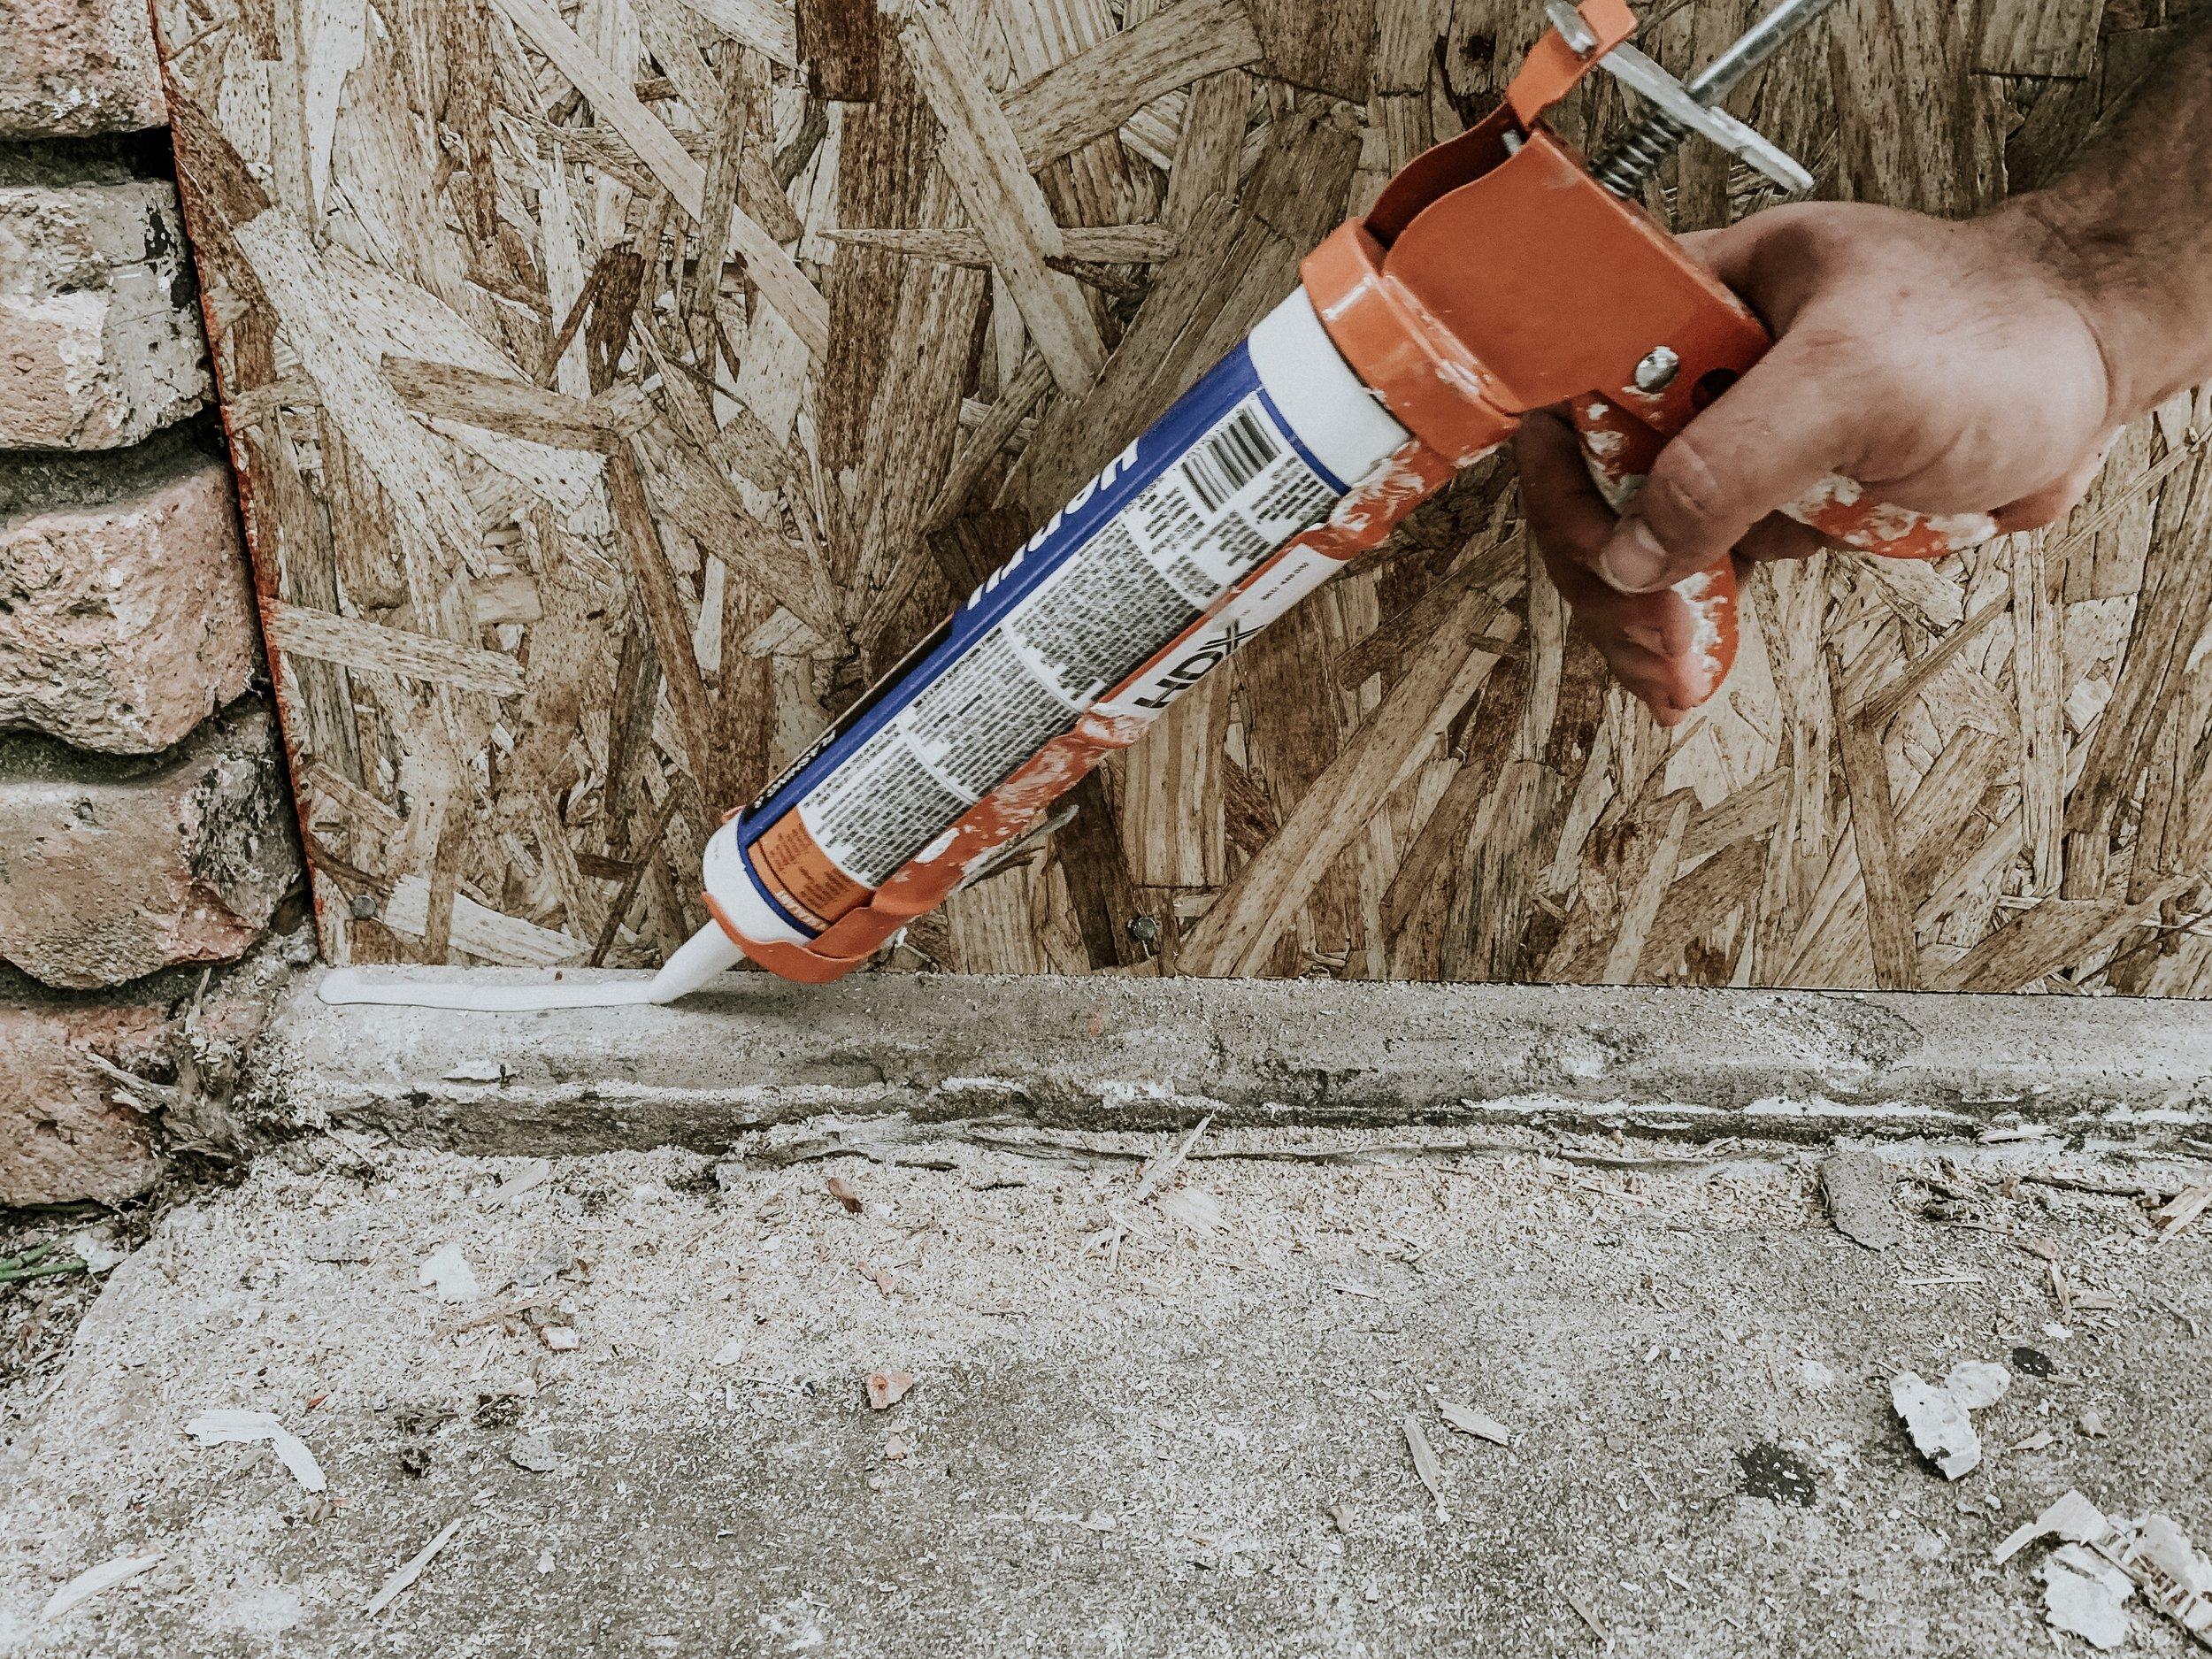 Henry Construction Adhesive http://bit.ly/2G8E8yj